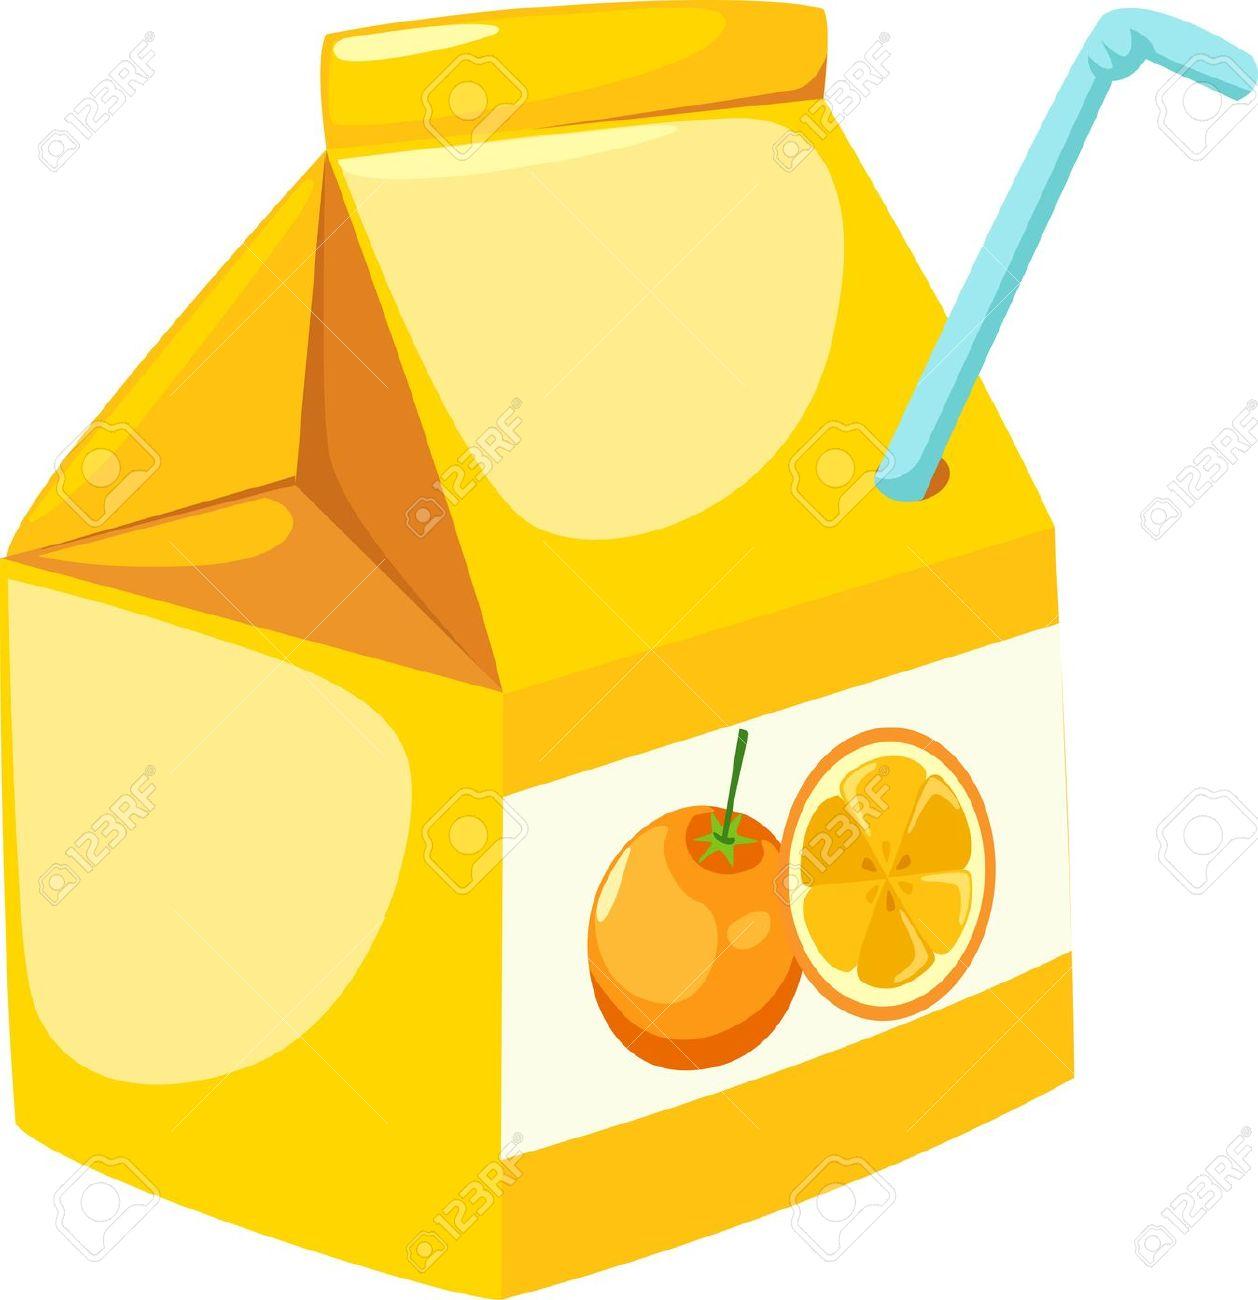 Orange Juice Bottle Clipart.